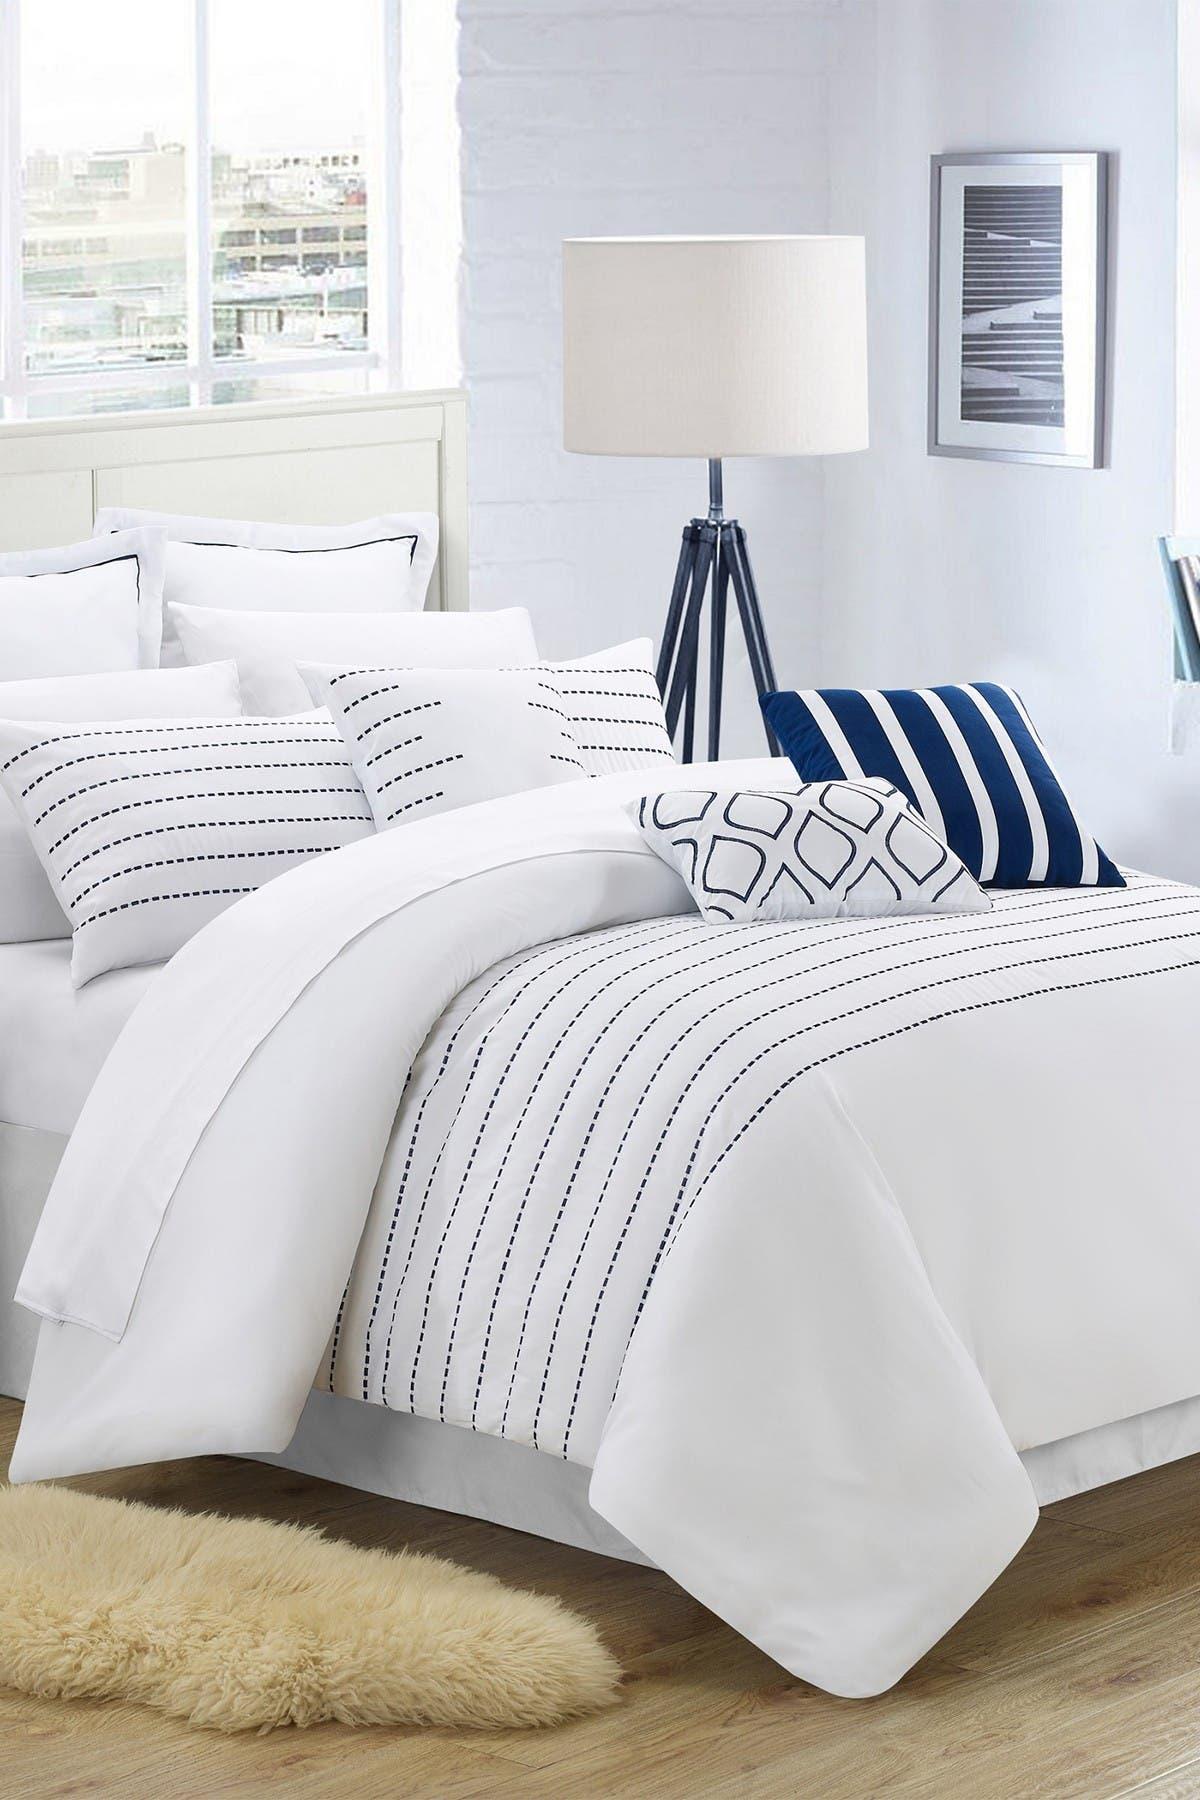 Image of Chic Home Bedding Queen Cranston Super Rich Microfiber Stitch Embroidered Comforter 9-Piece Set - White